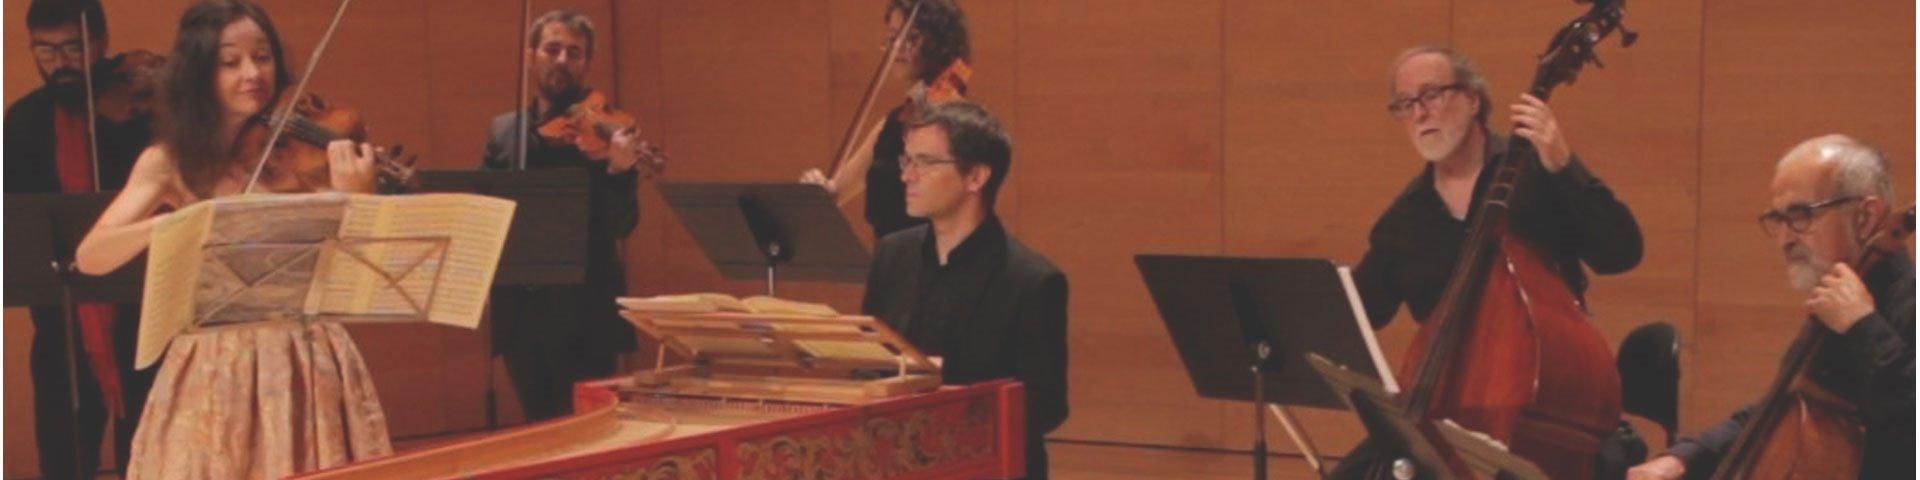 The king's sonatas